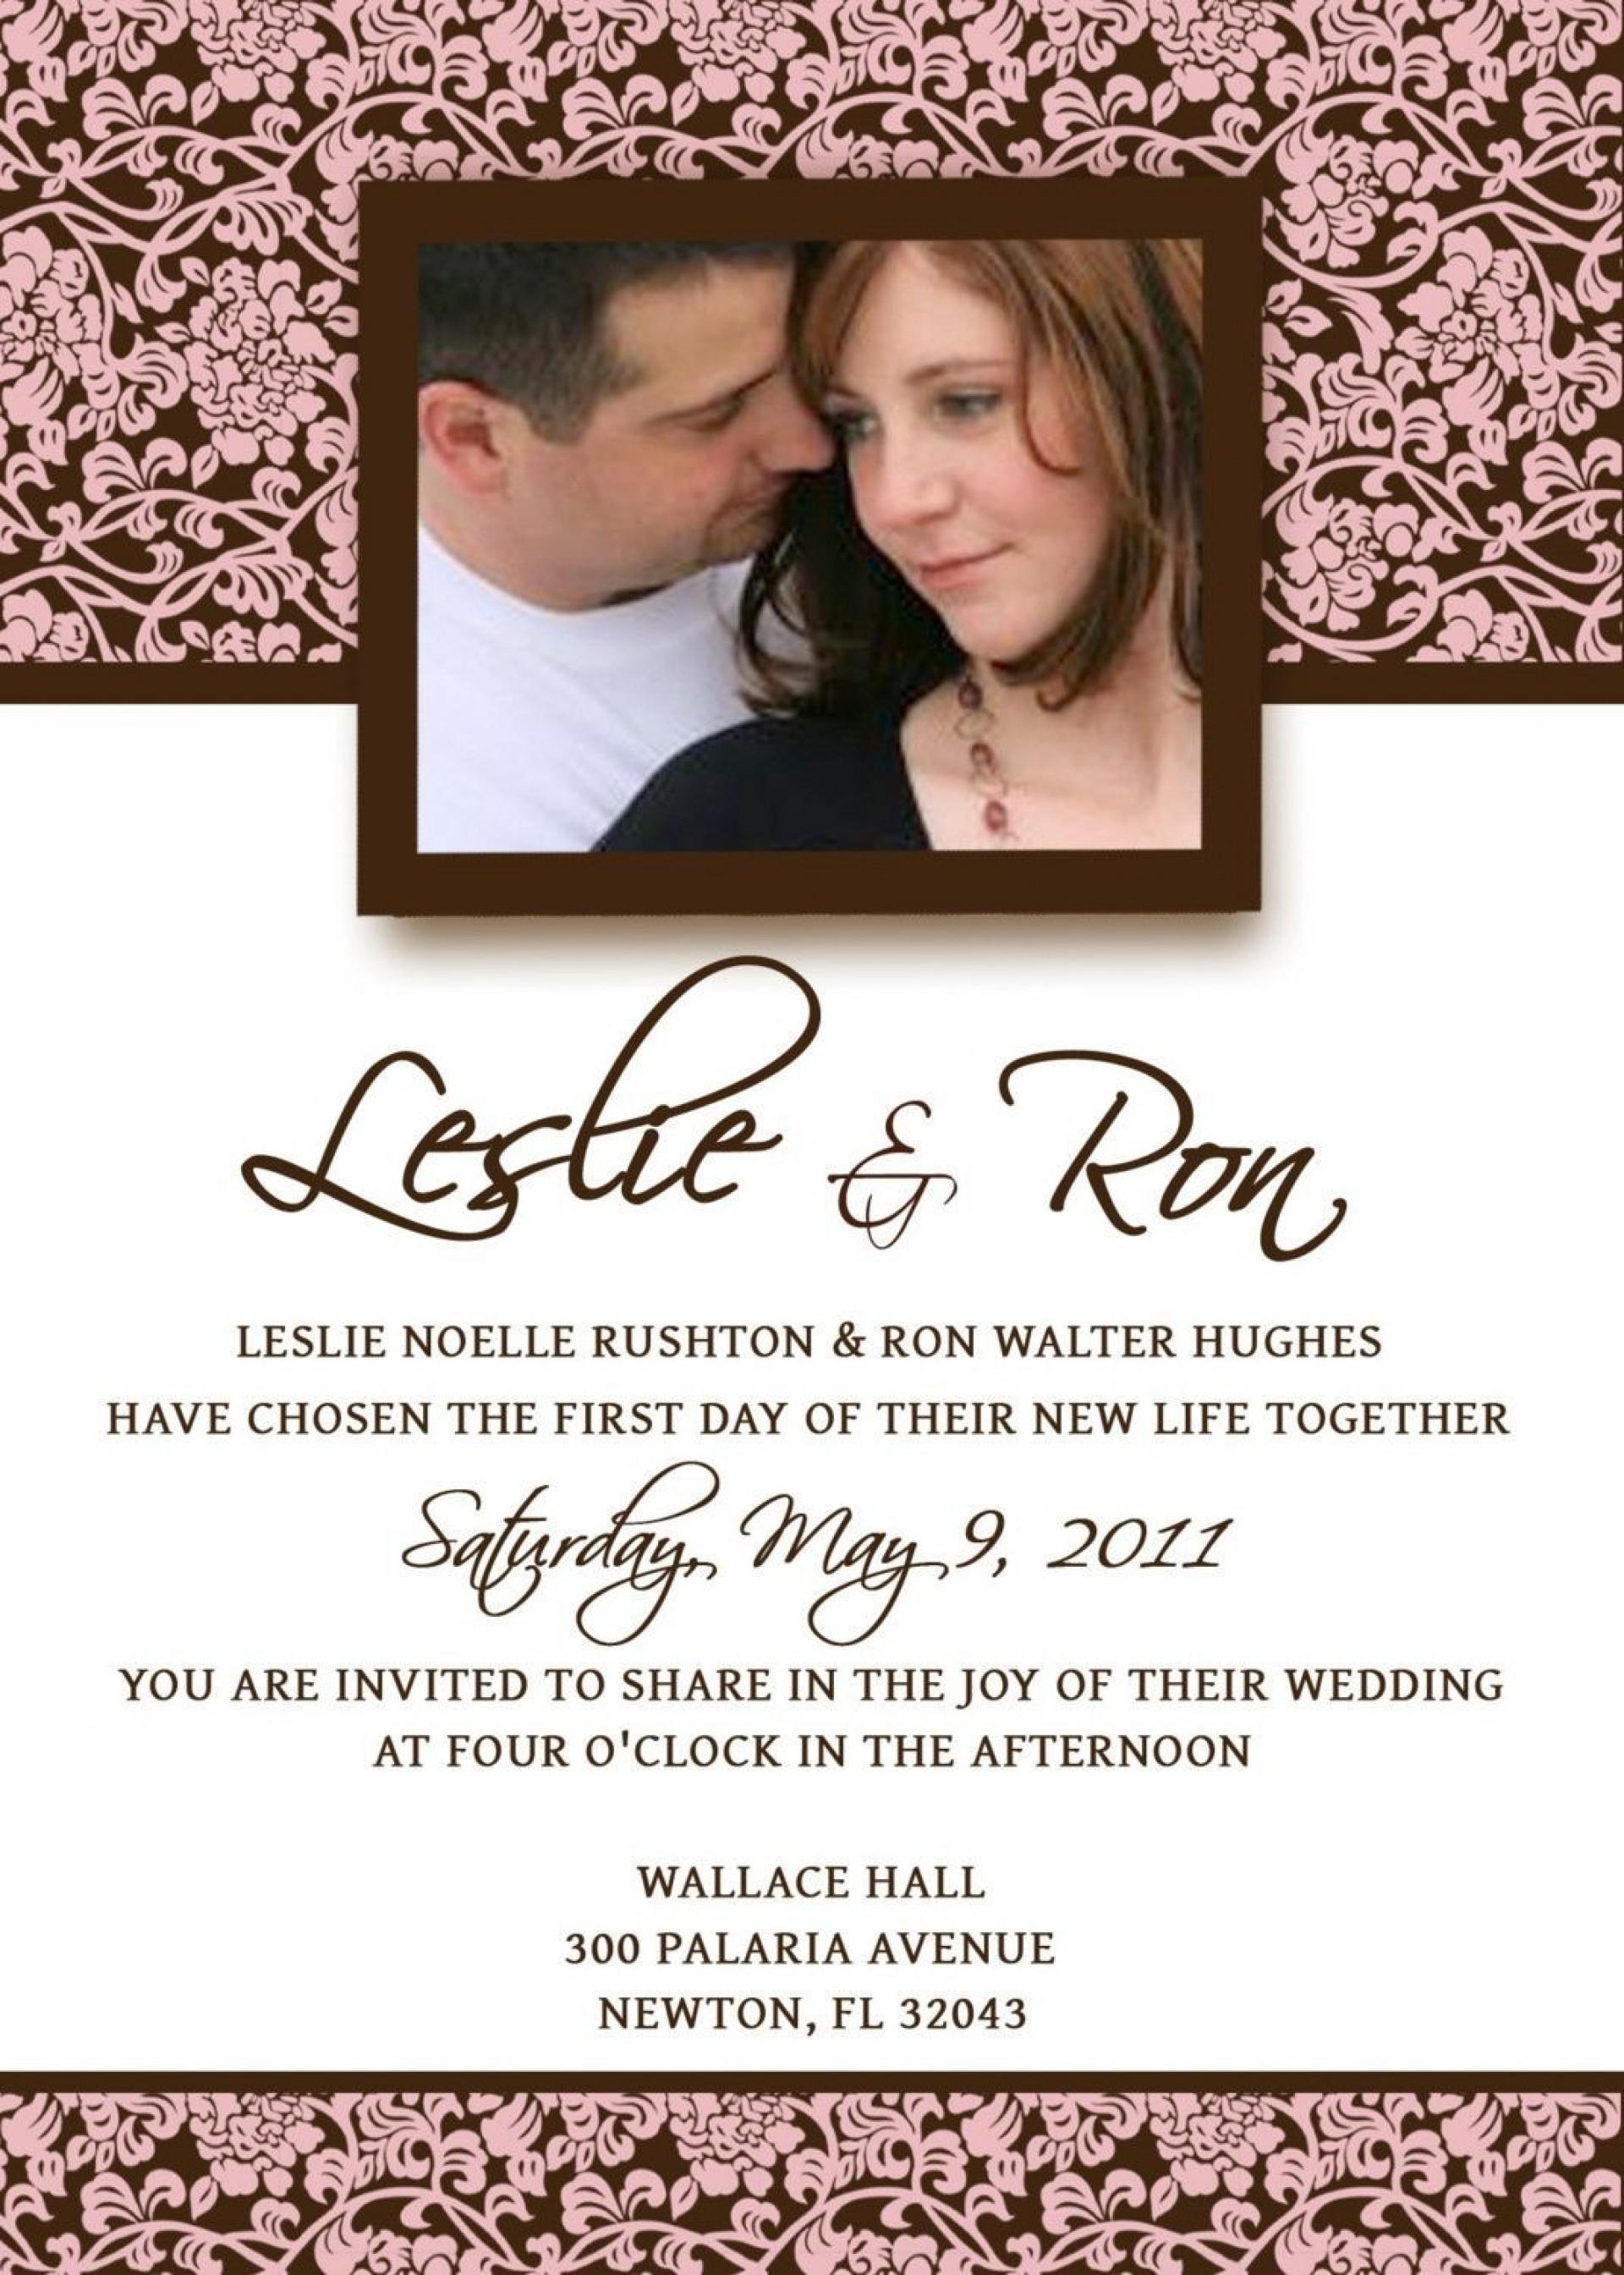 007 Incredible Sample Wedding Invitation Template Free Download Image  Wording1920